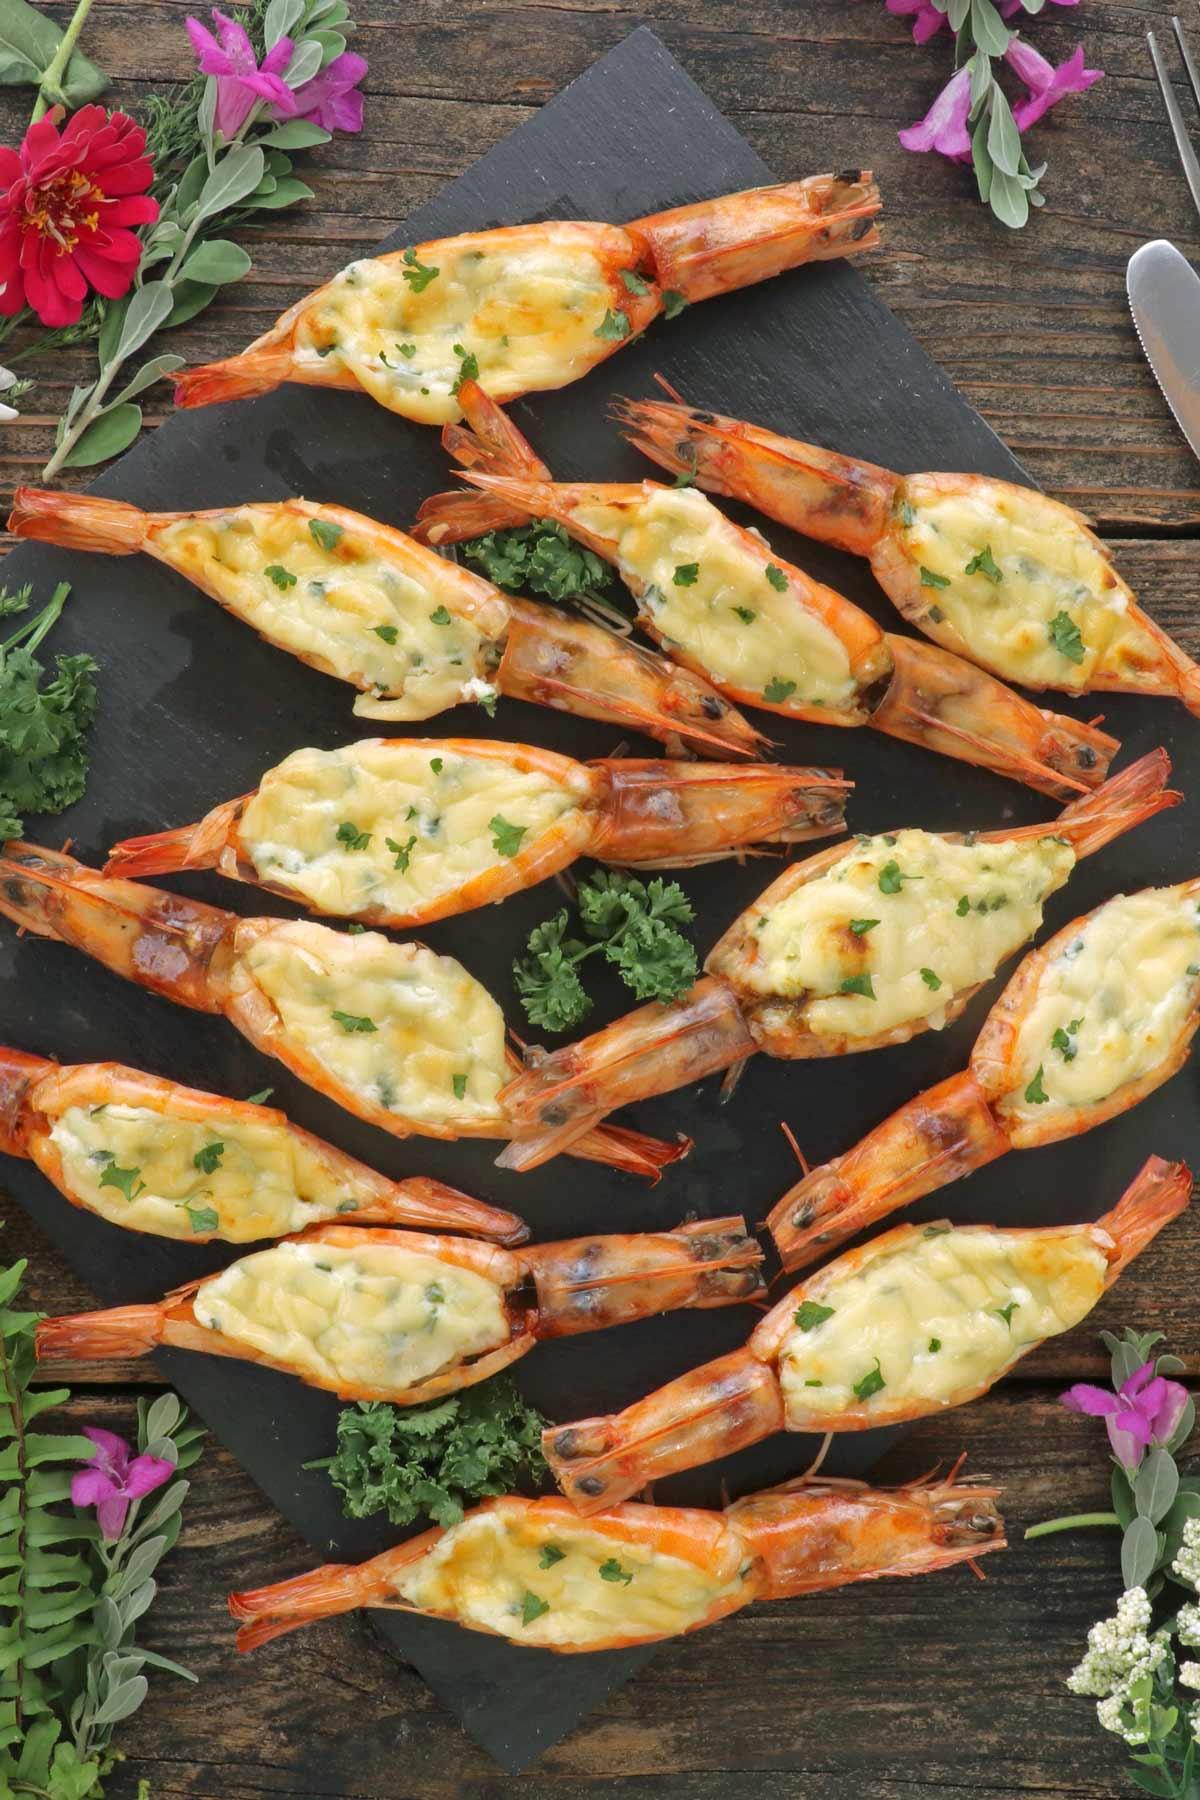 Cheesy baked butterflied shrimp.